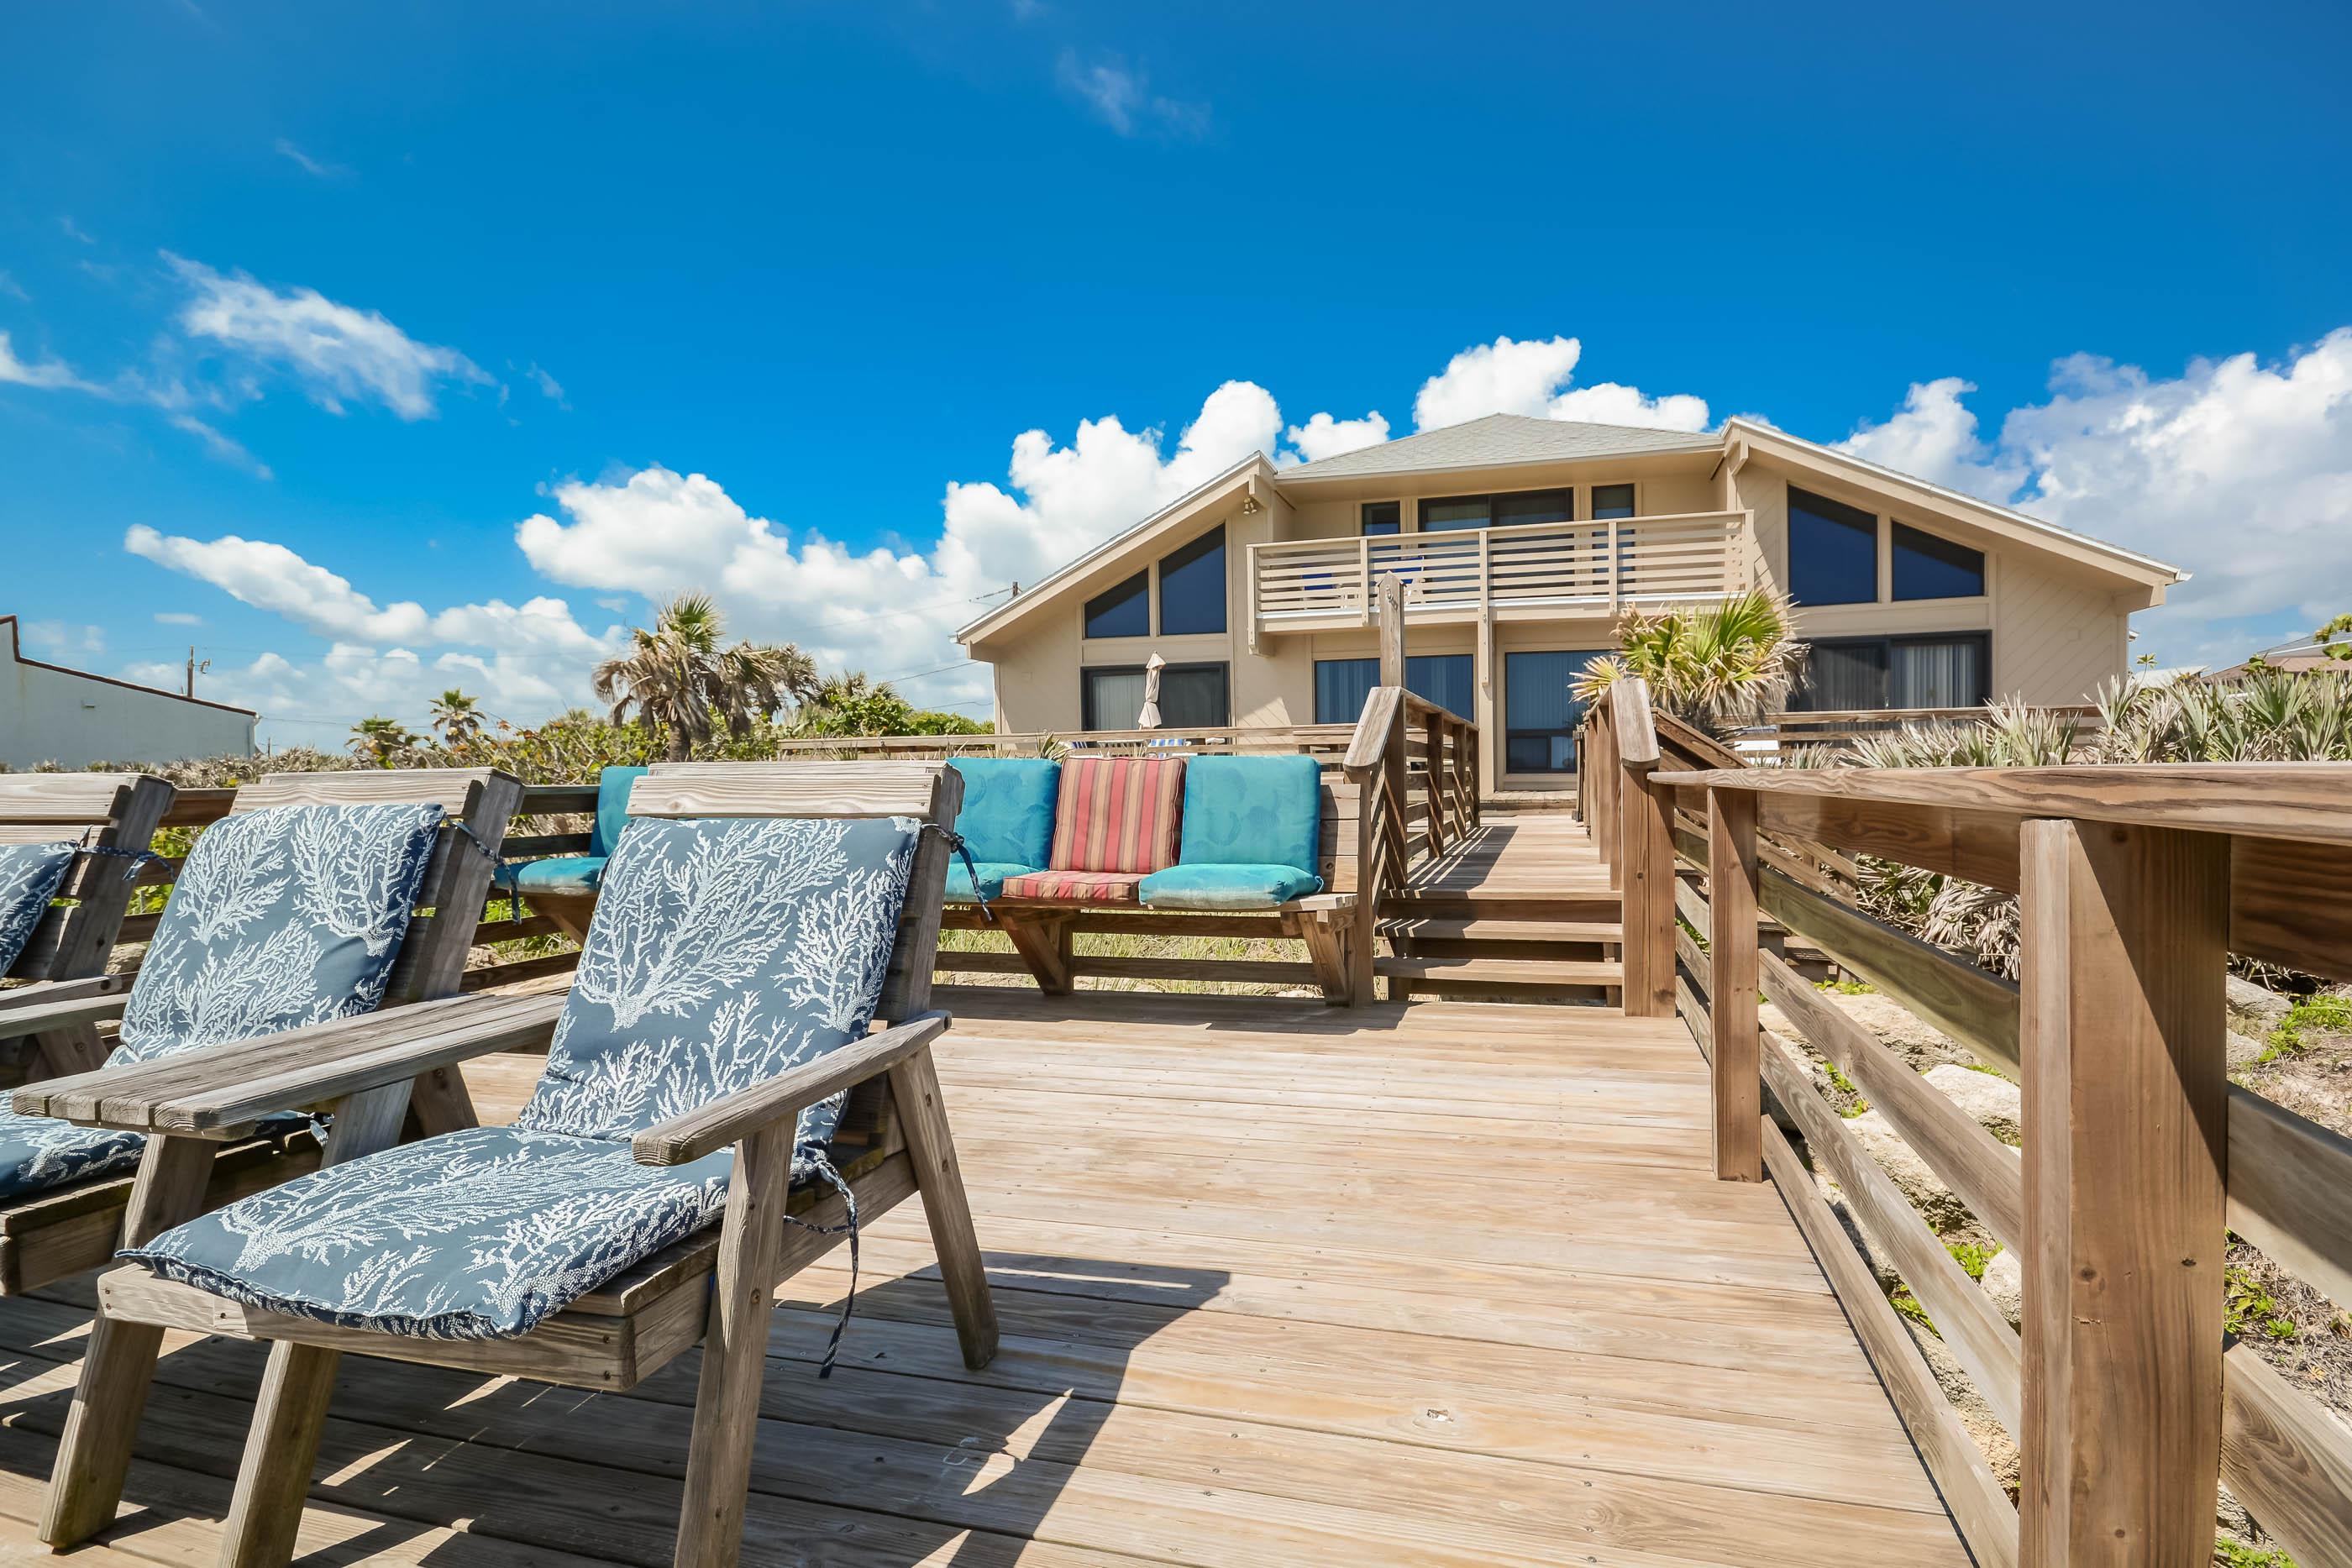 New Smyrna Beach Rental Properties